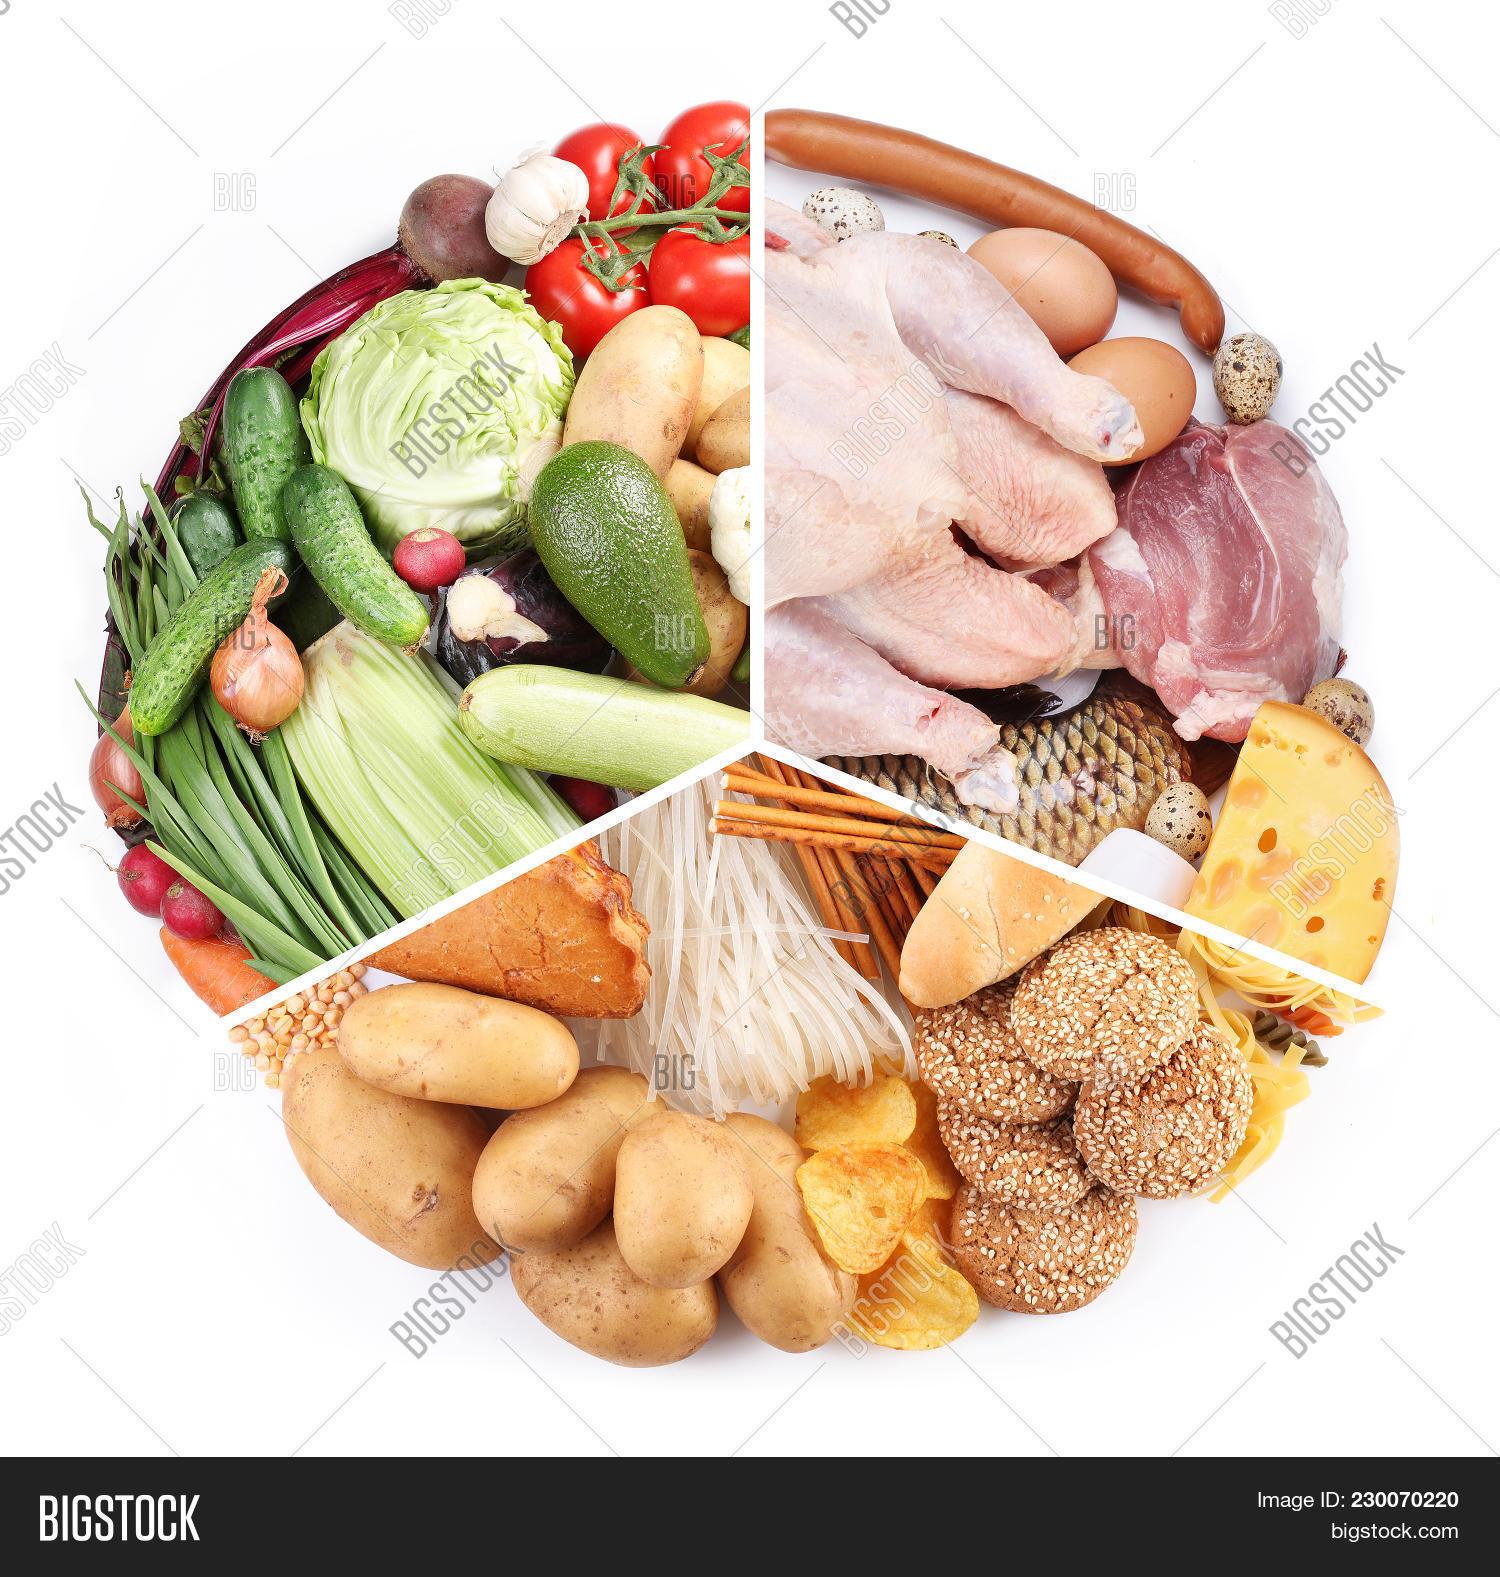 Food Pyramidt Image Amp Photo Free Trial